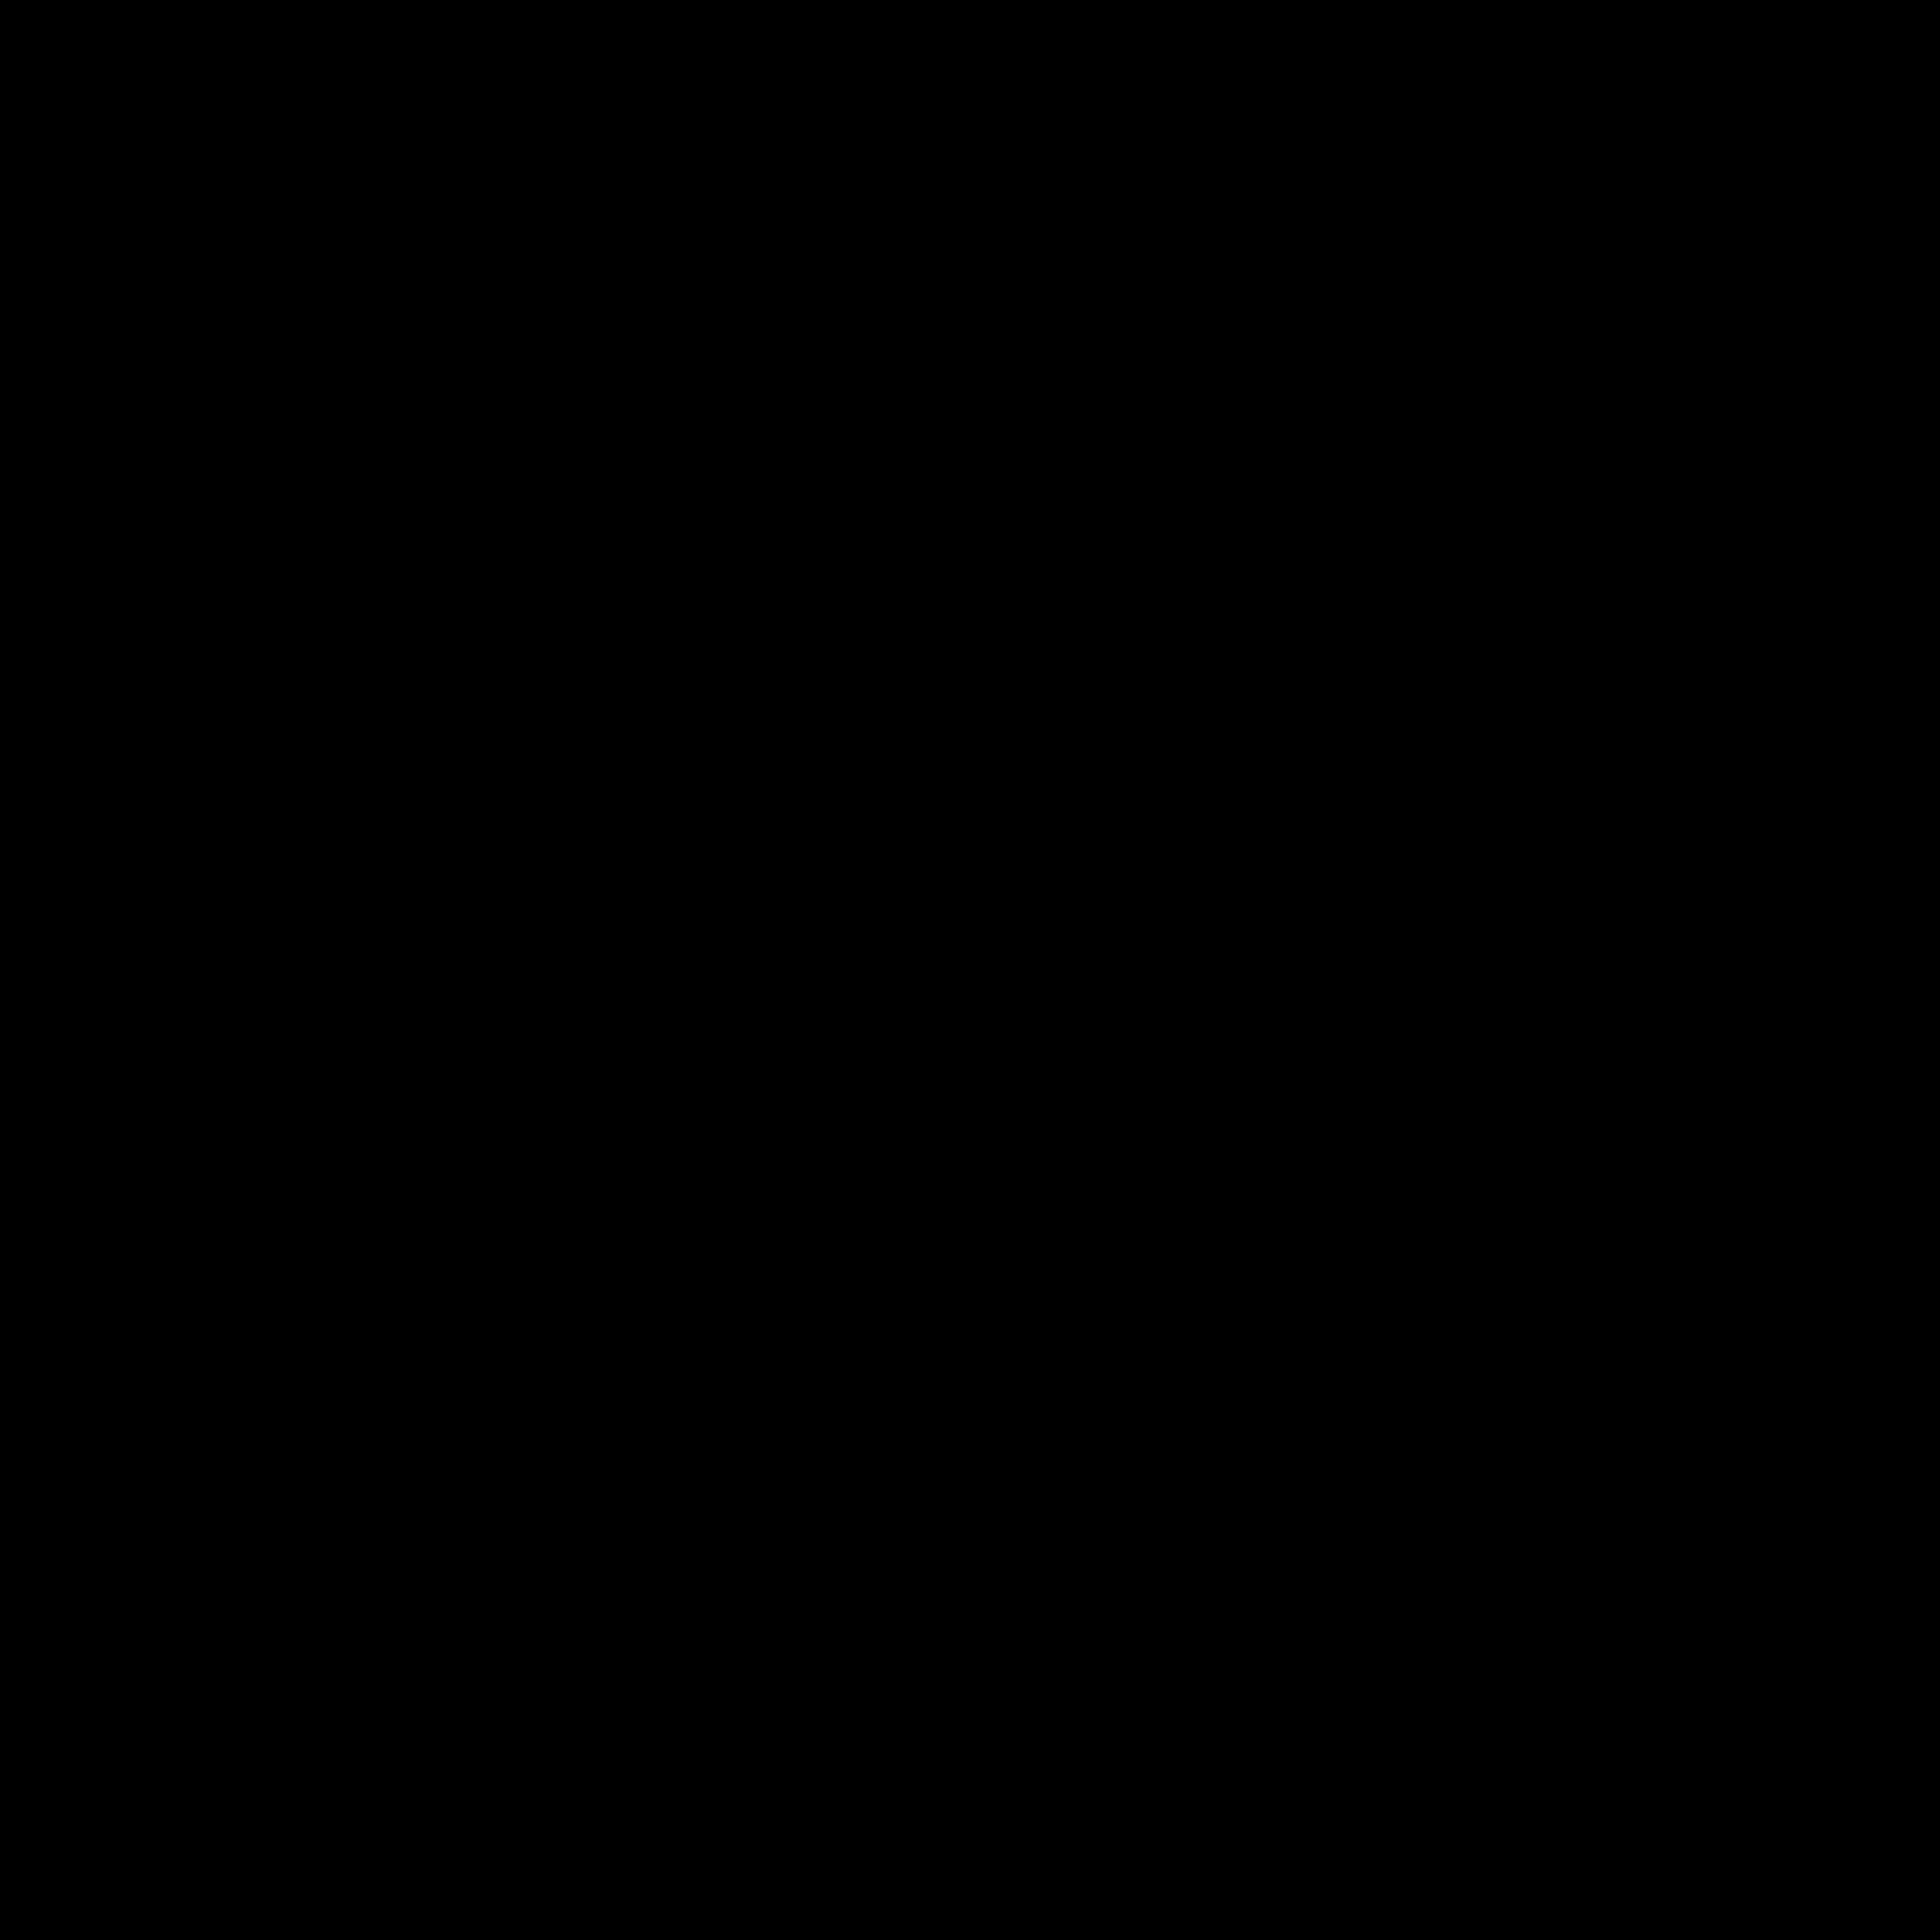 logo nike symbol brand sign meaning history evolution png